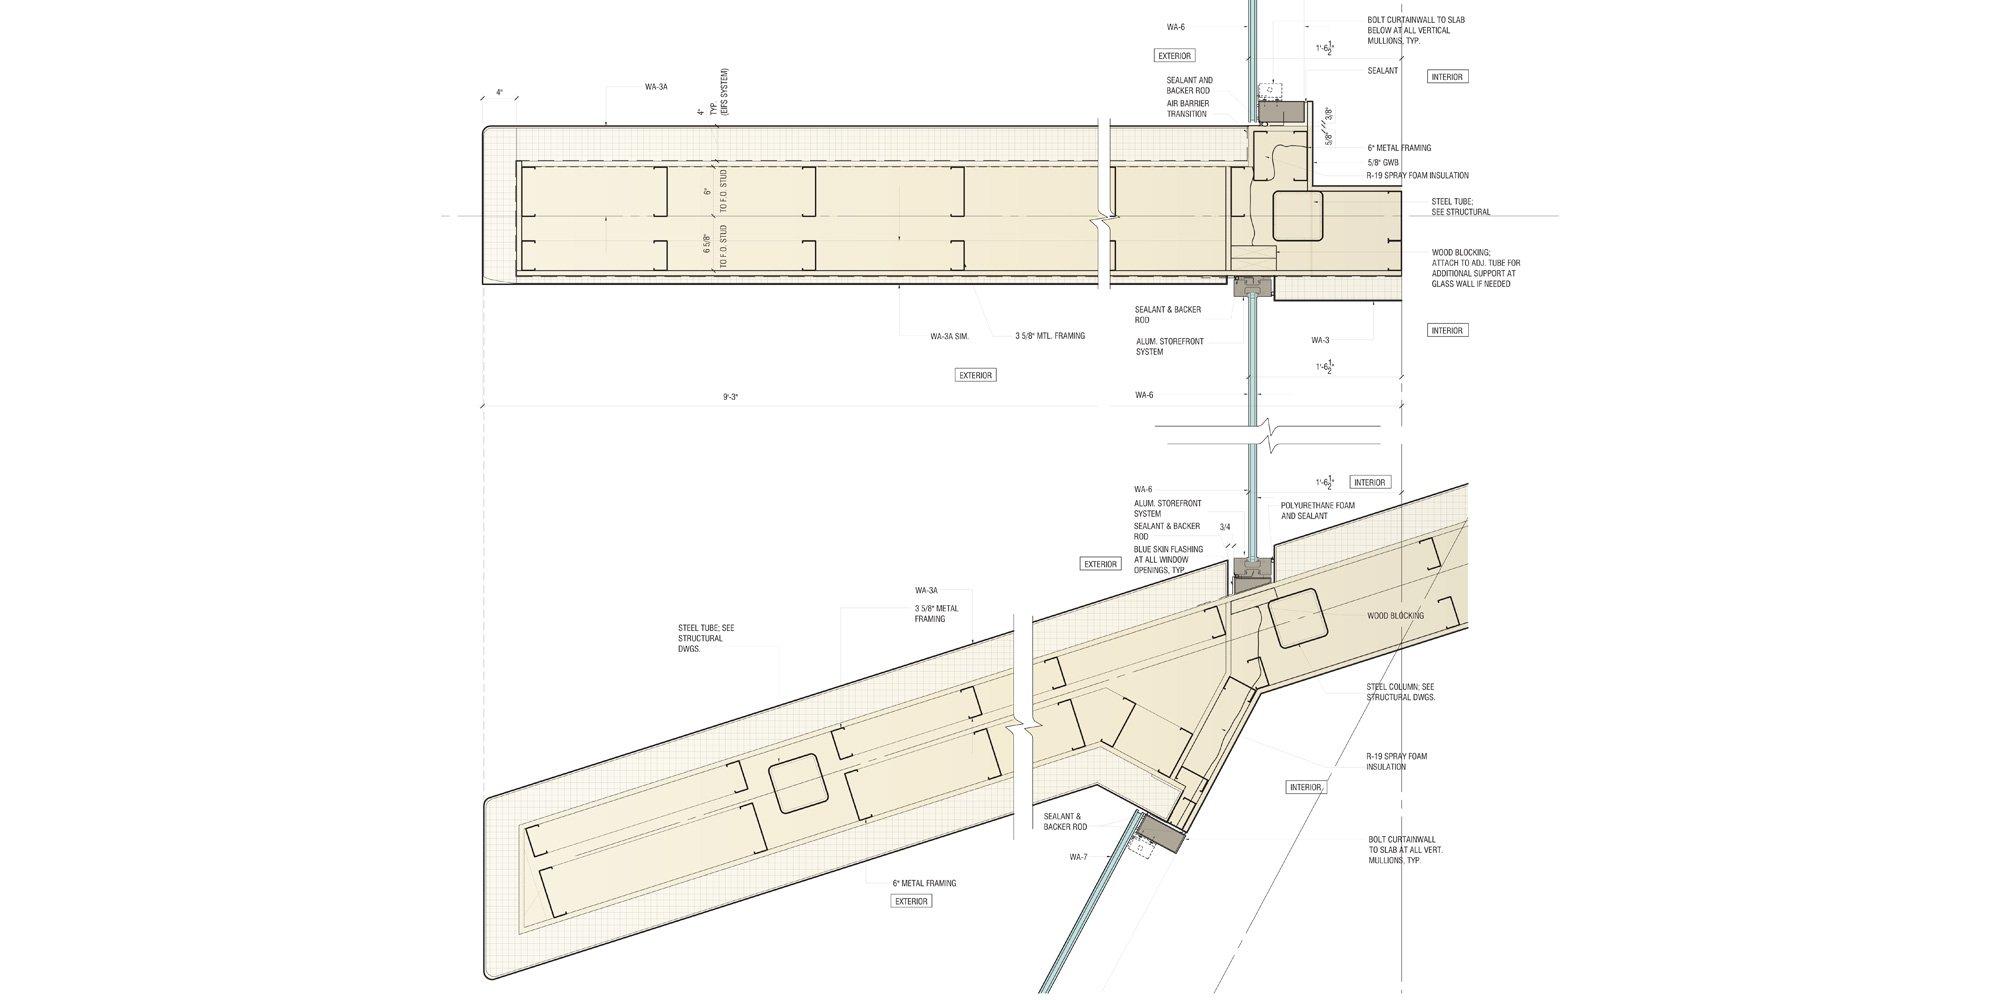 Dettaglio B © Shinberg.Levinas Architects